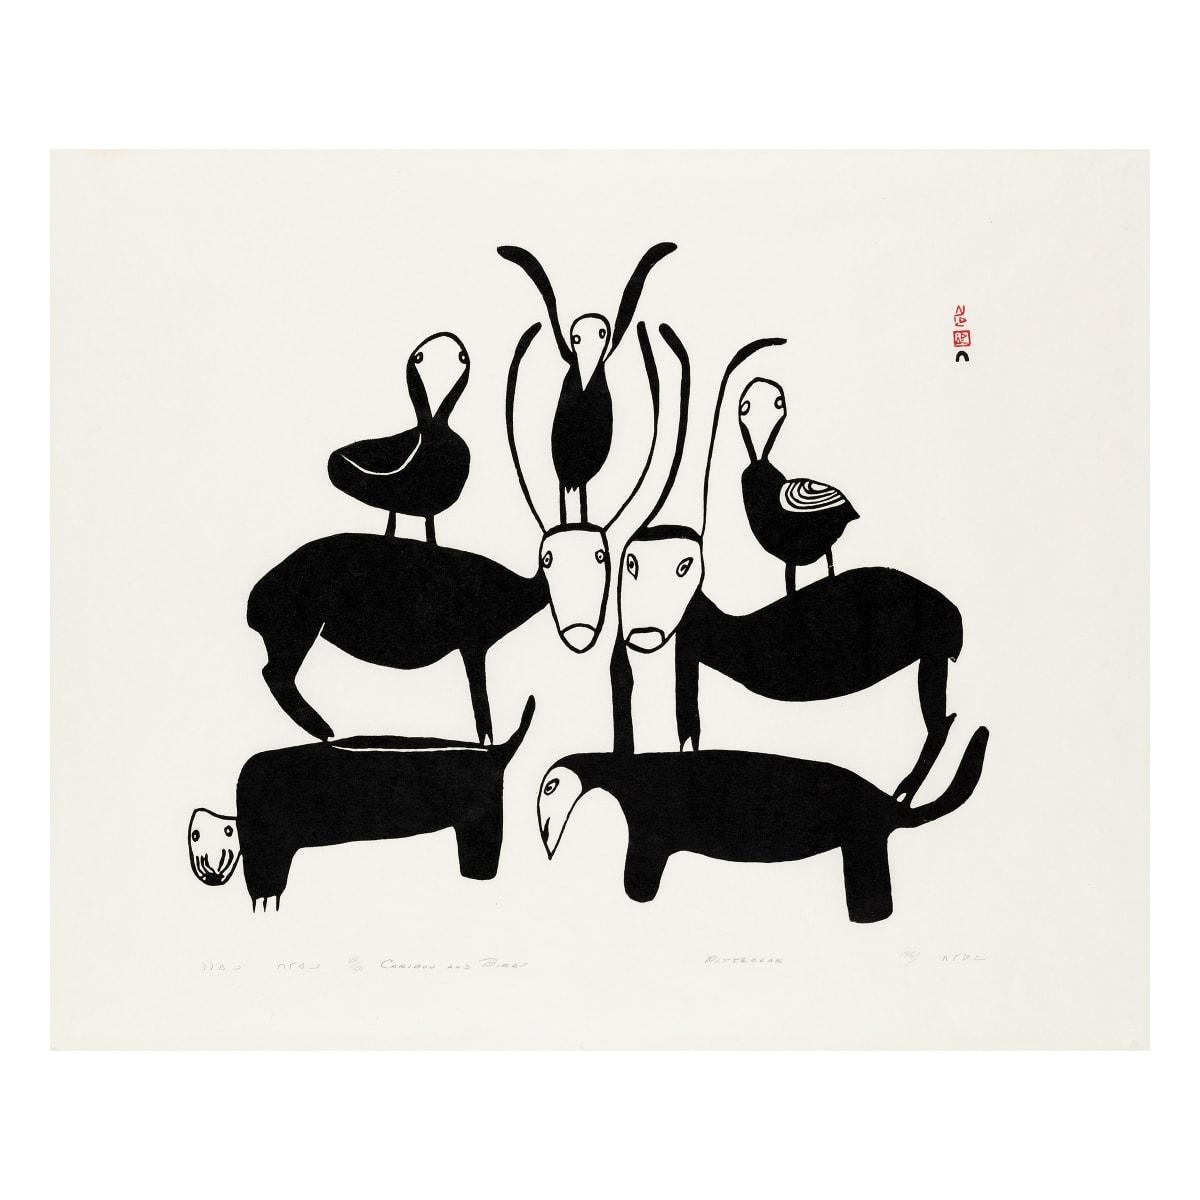 PITSEOLAK ASHOONA, O.C., R.C.A. (1904-1983) Kinngait (Cape Dorset) Caribou and Birds, 1963 REALIZED: $1,440